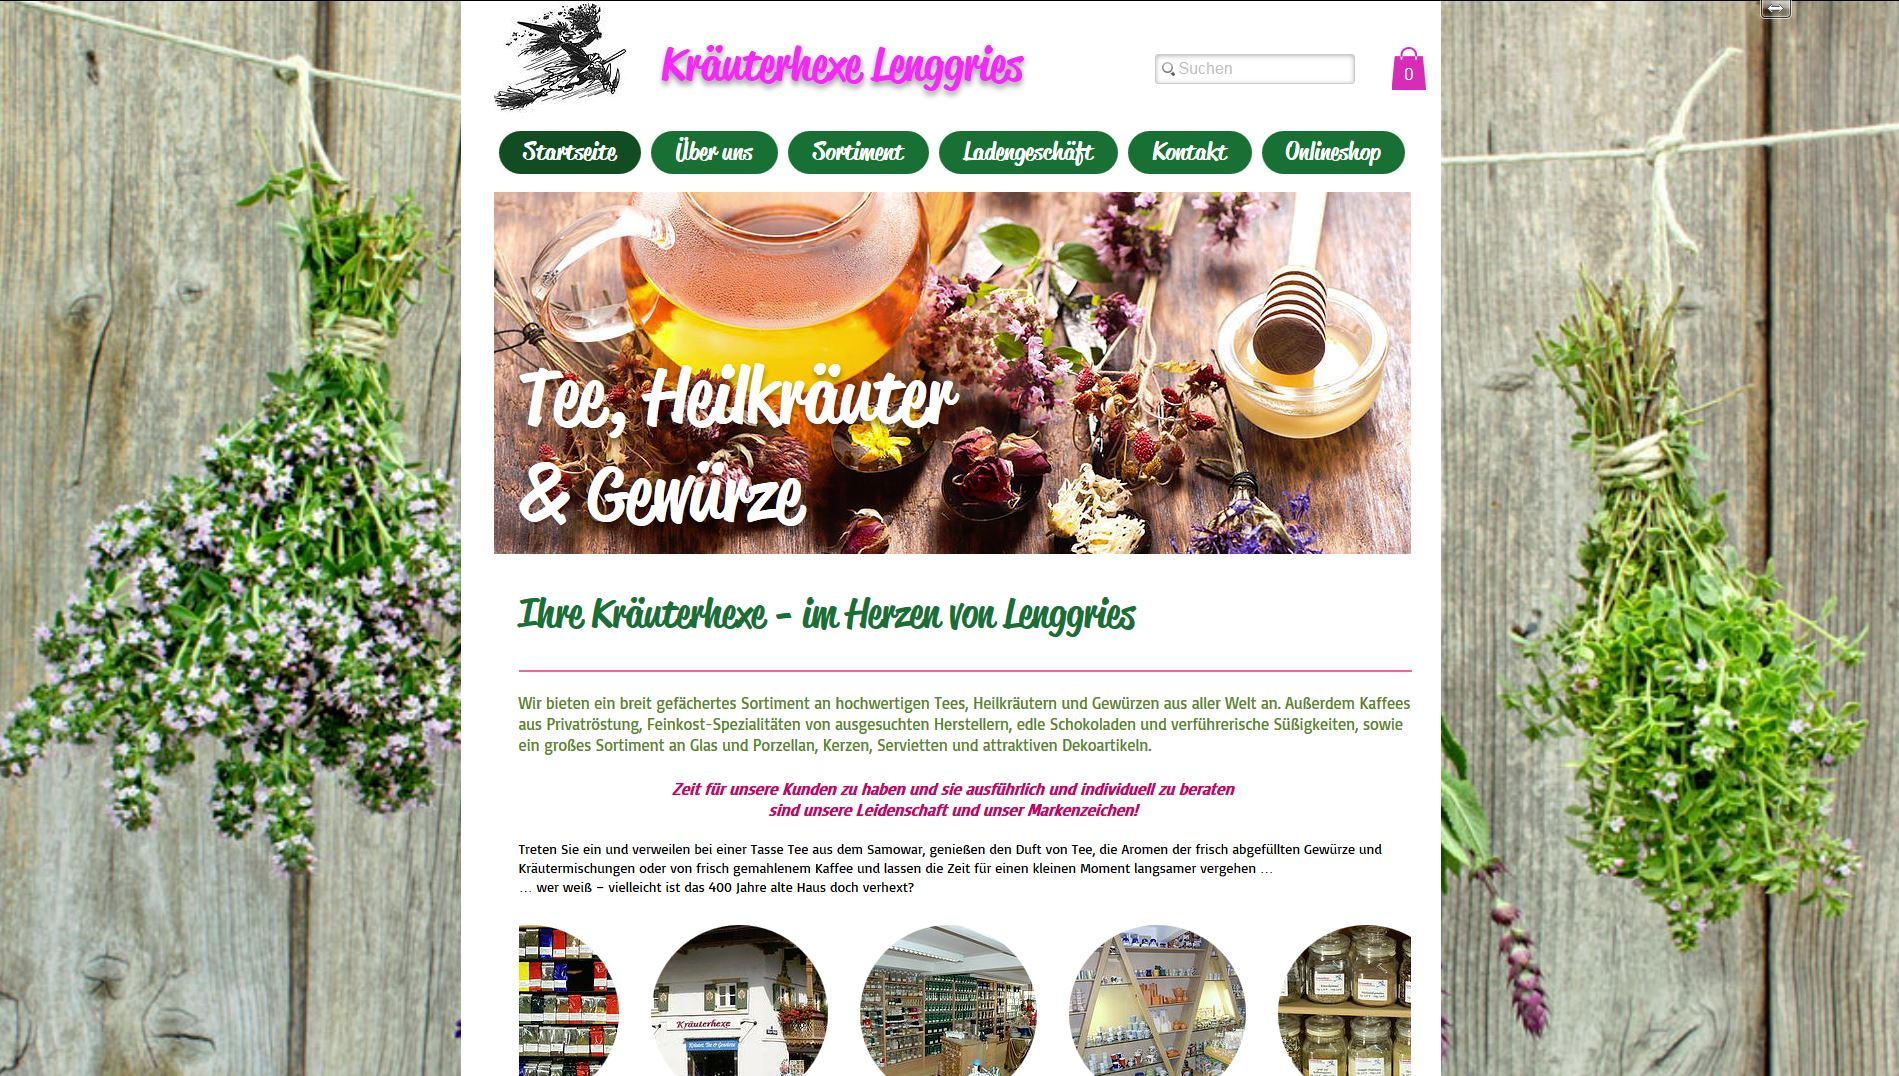 Kräuterhexe Lenggries - Ingrid Pumme